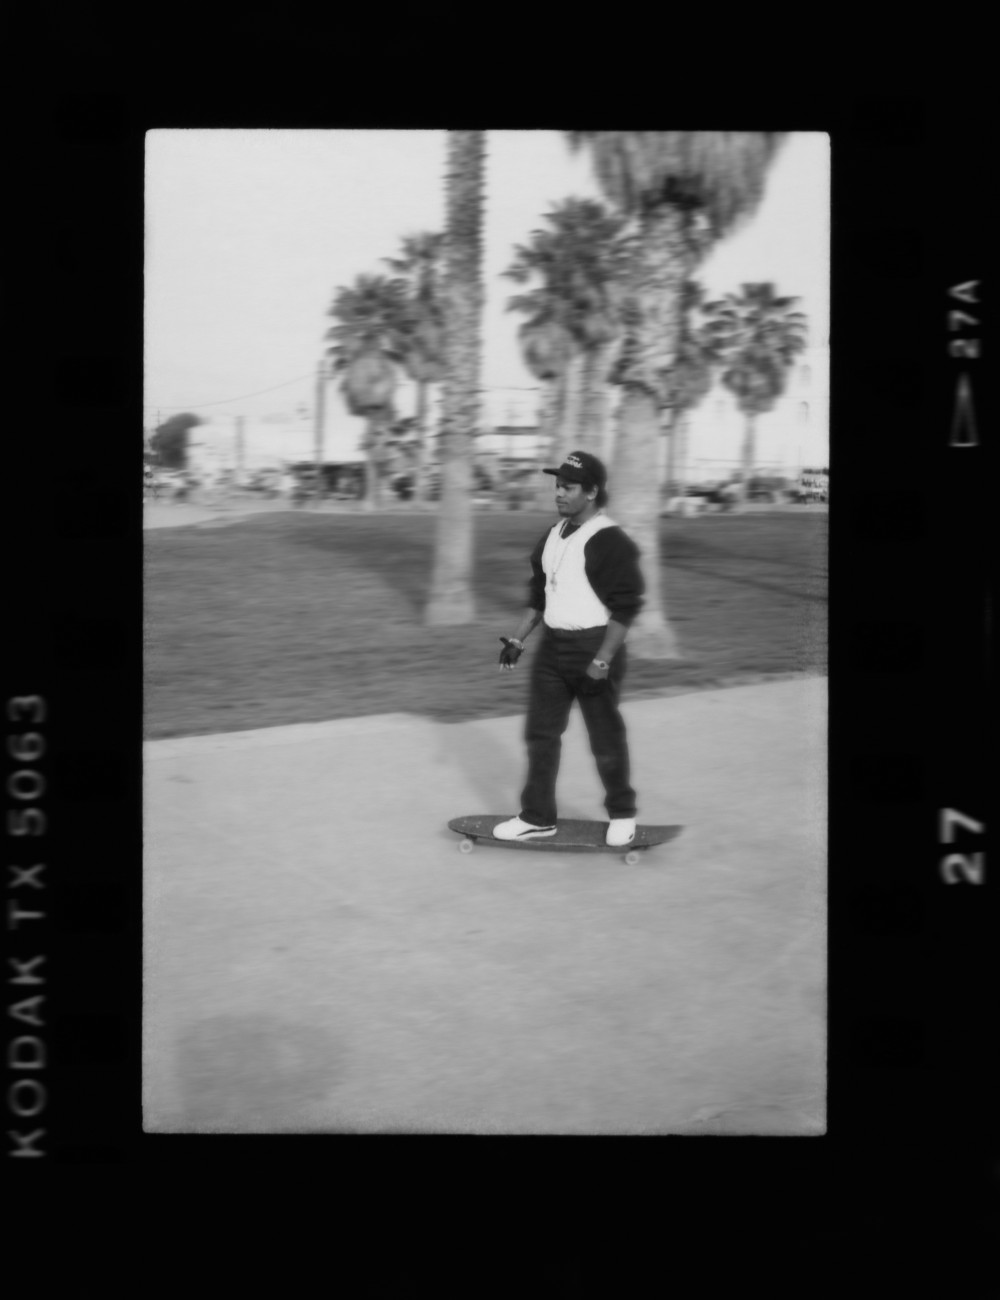 15. Eazy-E from N.W.A, skateboarding (1989). Photo by Ithaka Darin Pappas..jpg